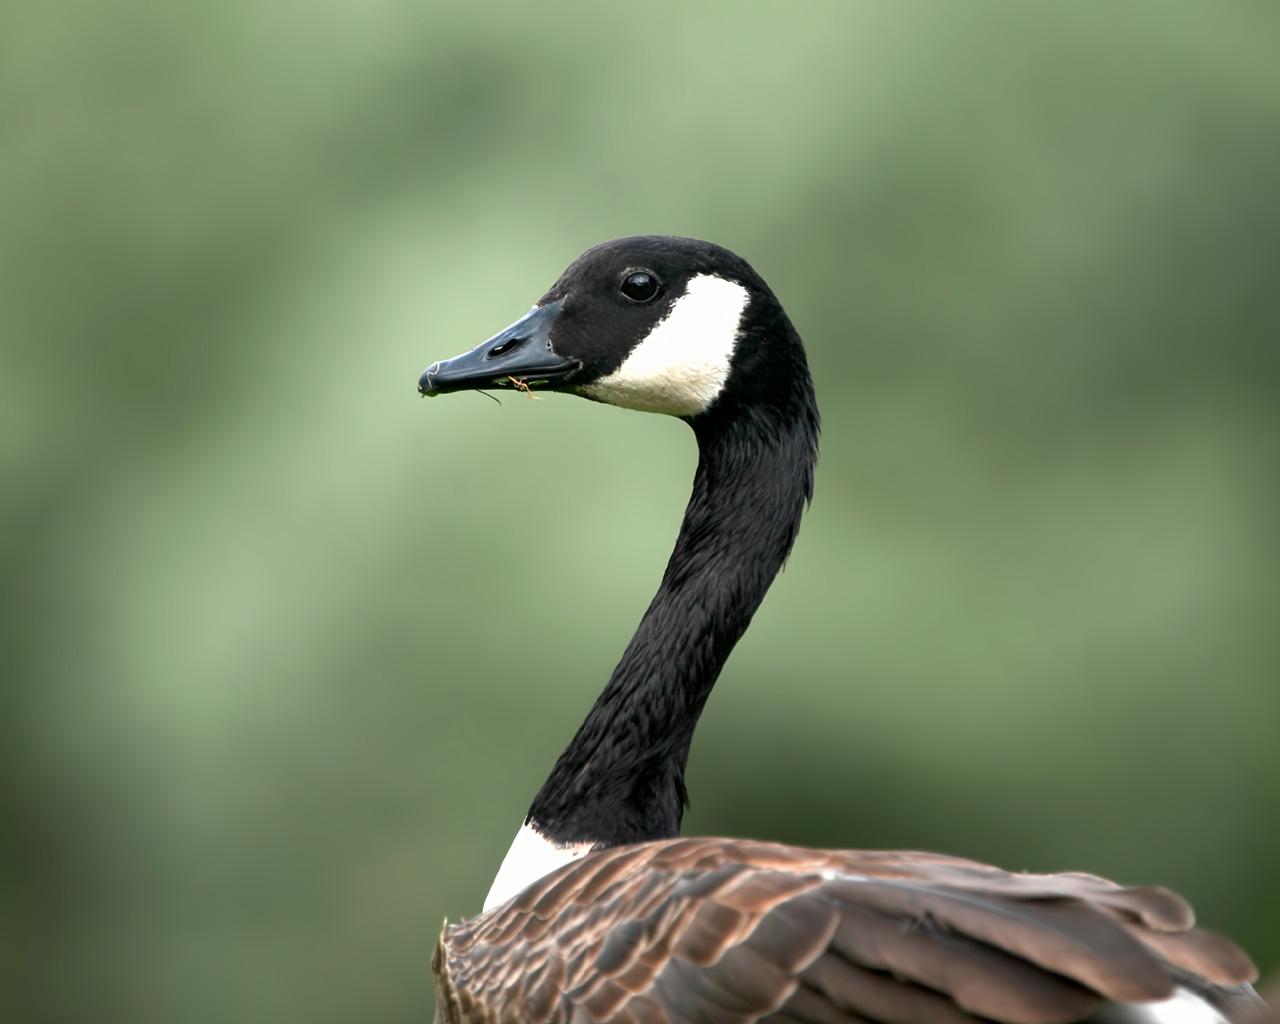 Geese Birds